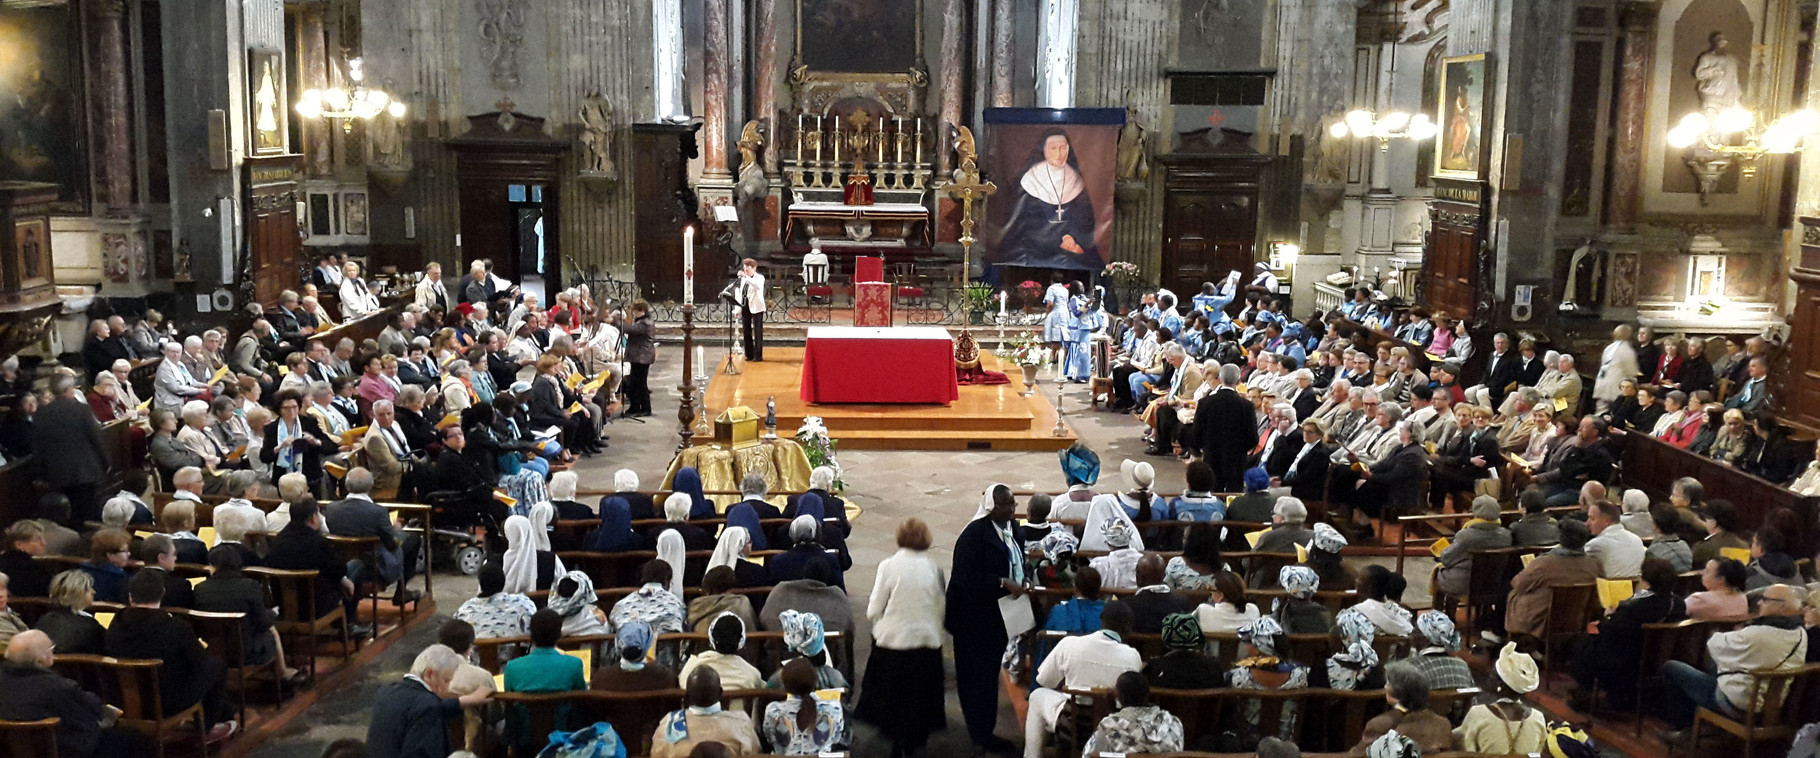 Castres : Igreja Saint Benoit dia 24 de maio de 2015